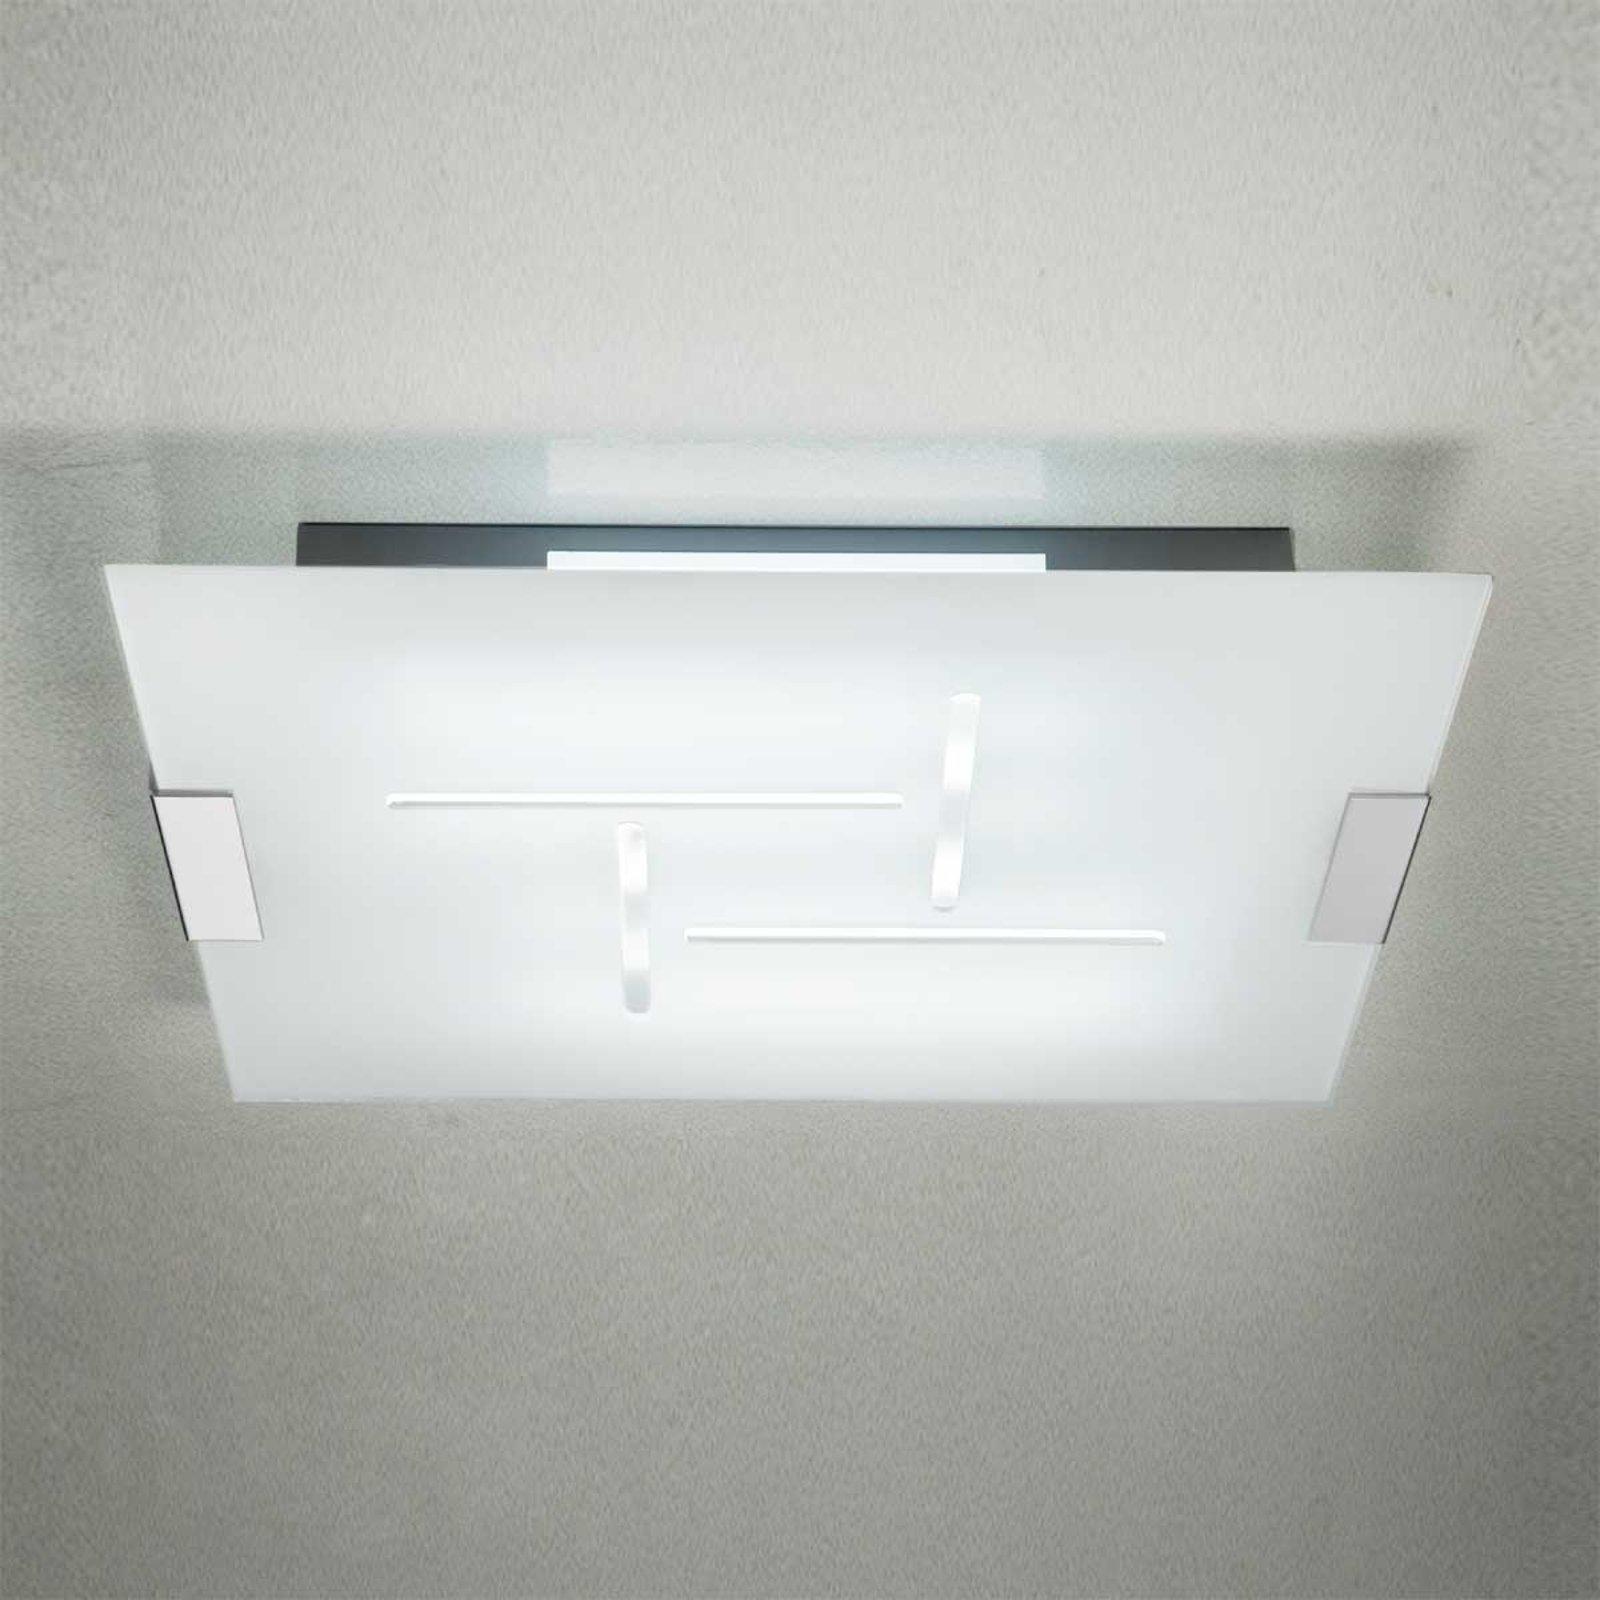 Taklampe SQUARE 8200, G5, 76 x 76 cm